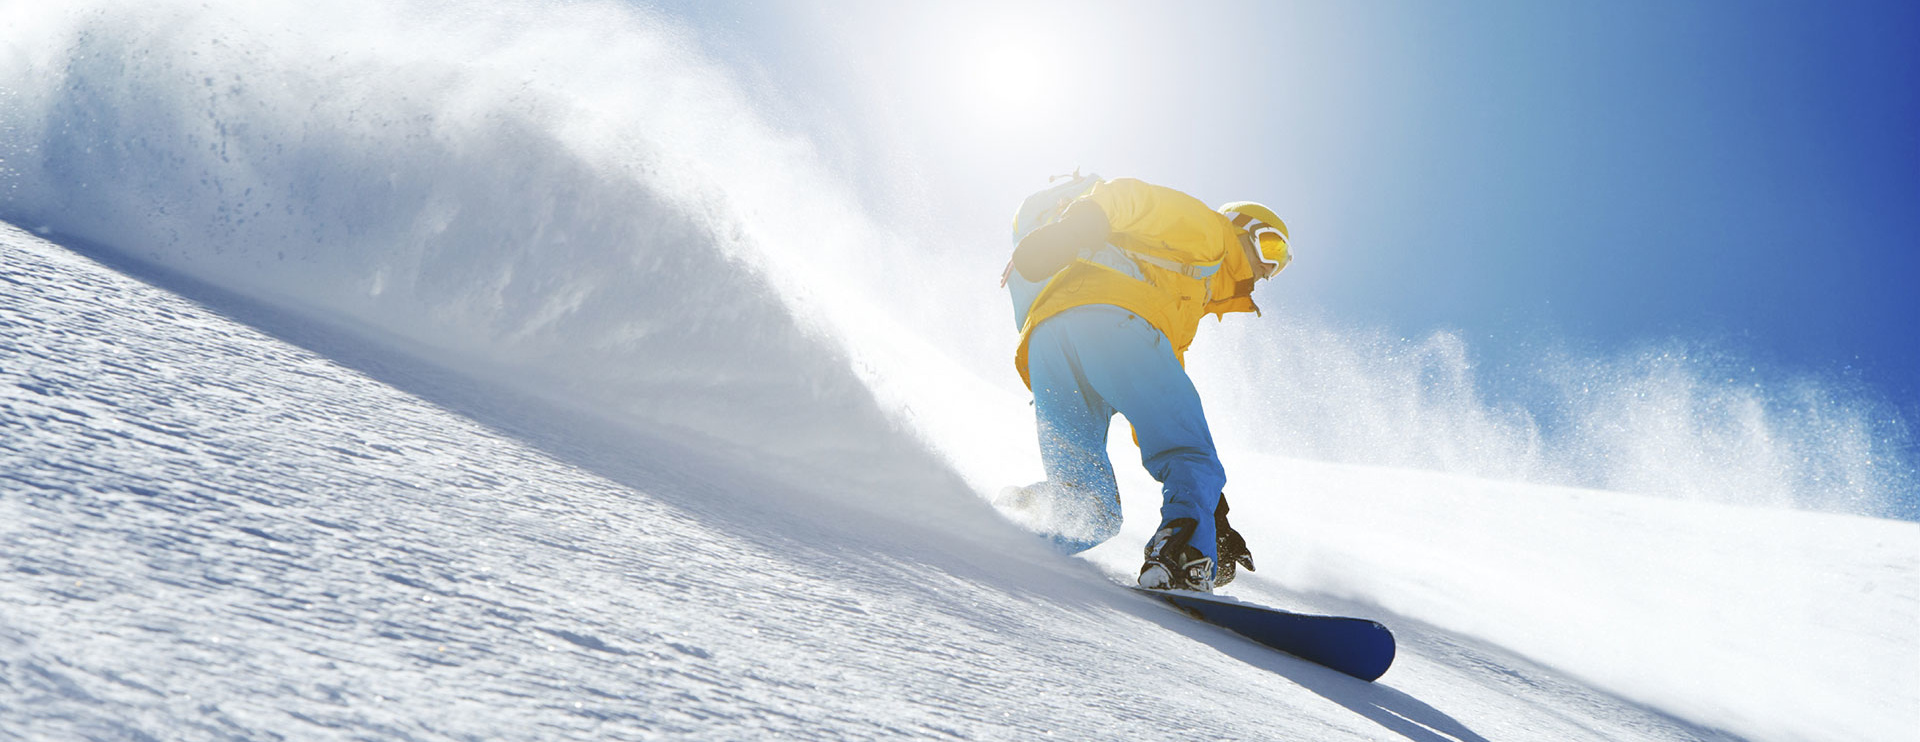 Snowboardverleih - Service in Obertauern & Turracher Höhe